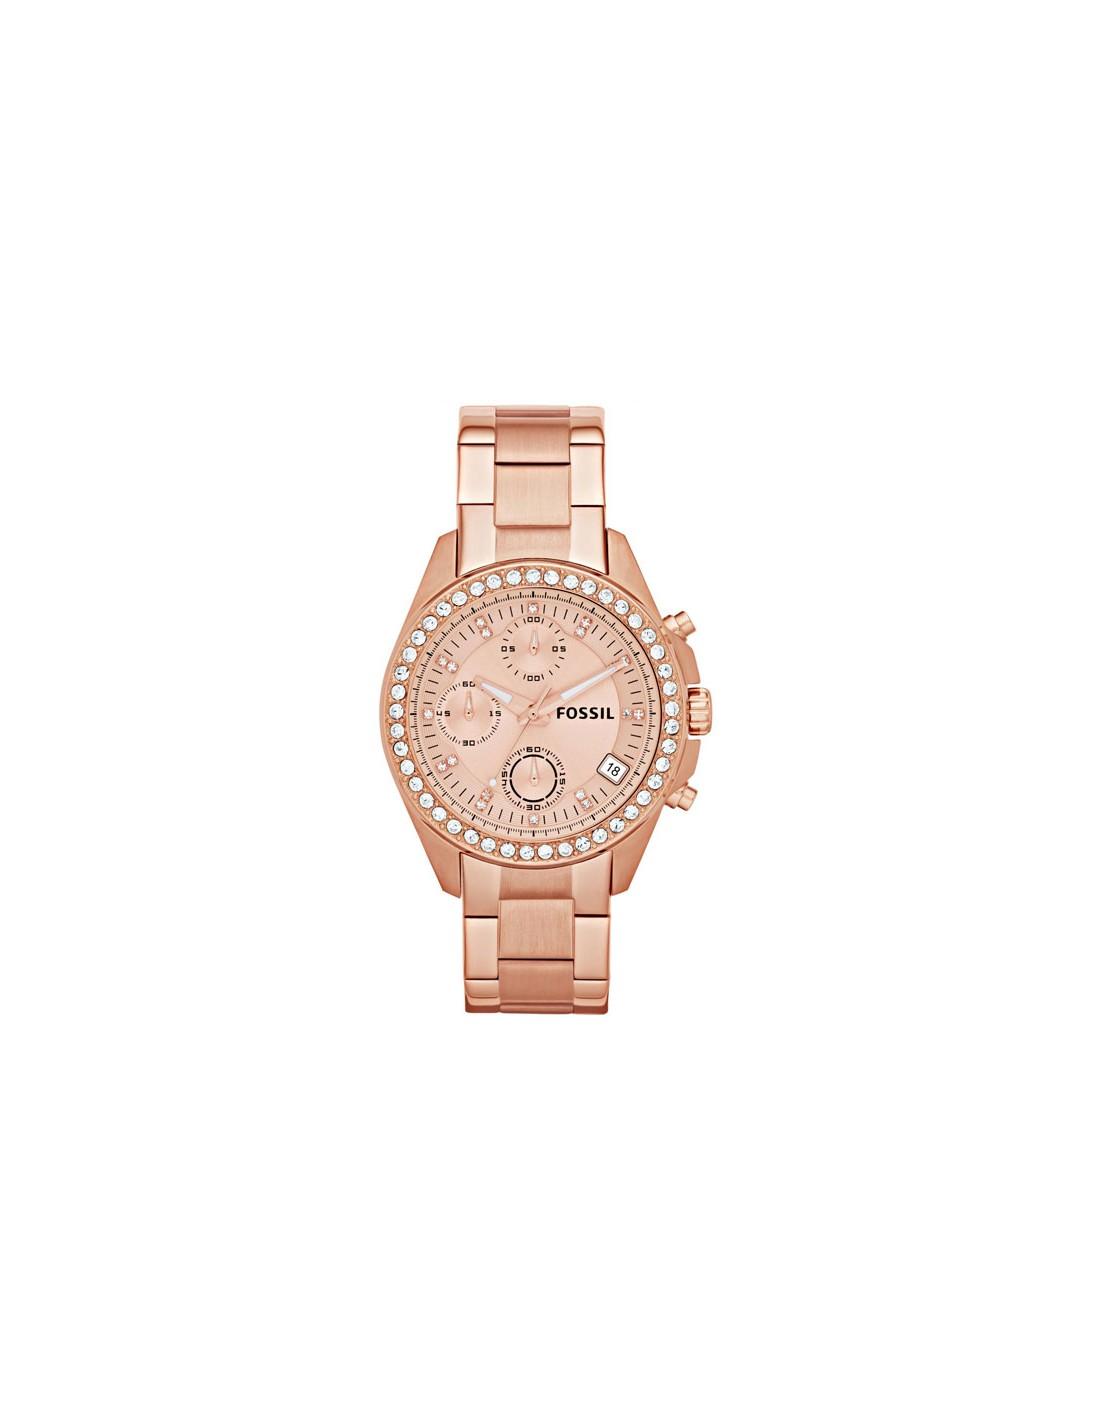 325560dab5d2 Novedad Reloj Fossil Mujer - ES3352